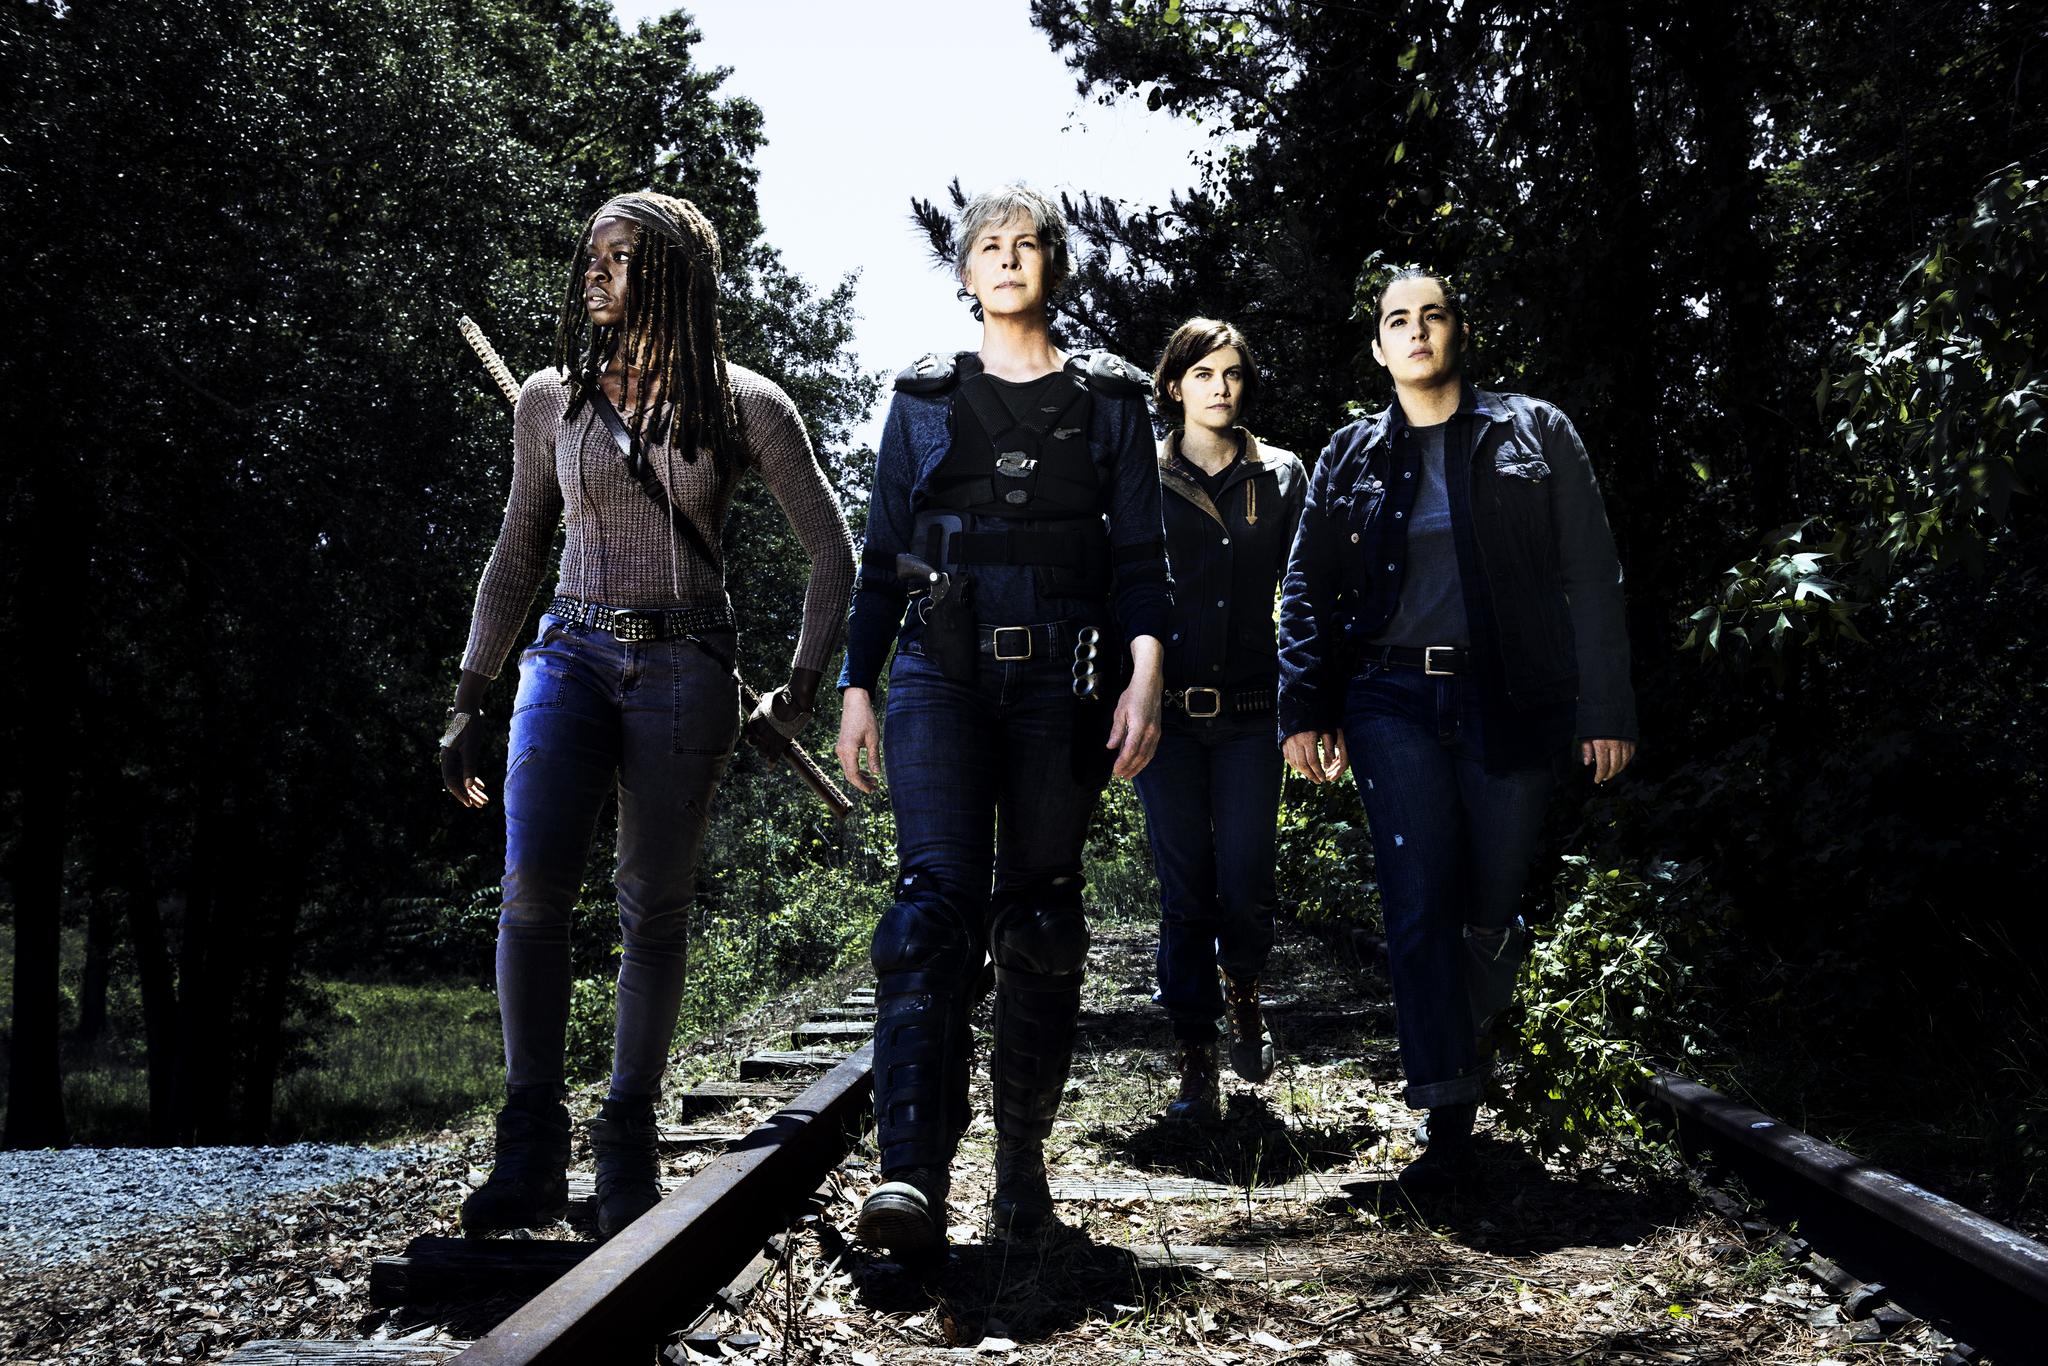 Melissa McBride, Alanna Masterson, Lauren Cohan, and Danai Gurira in The Walking Dead (2010)